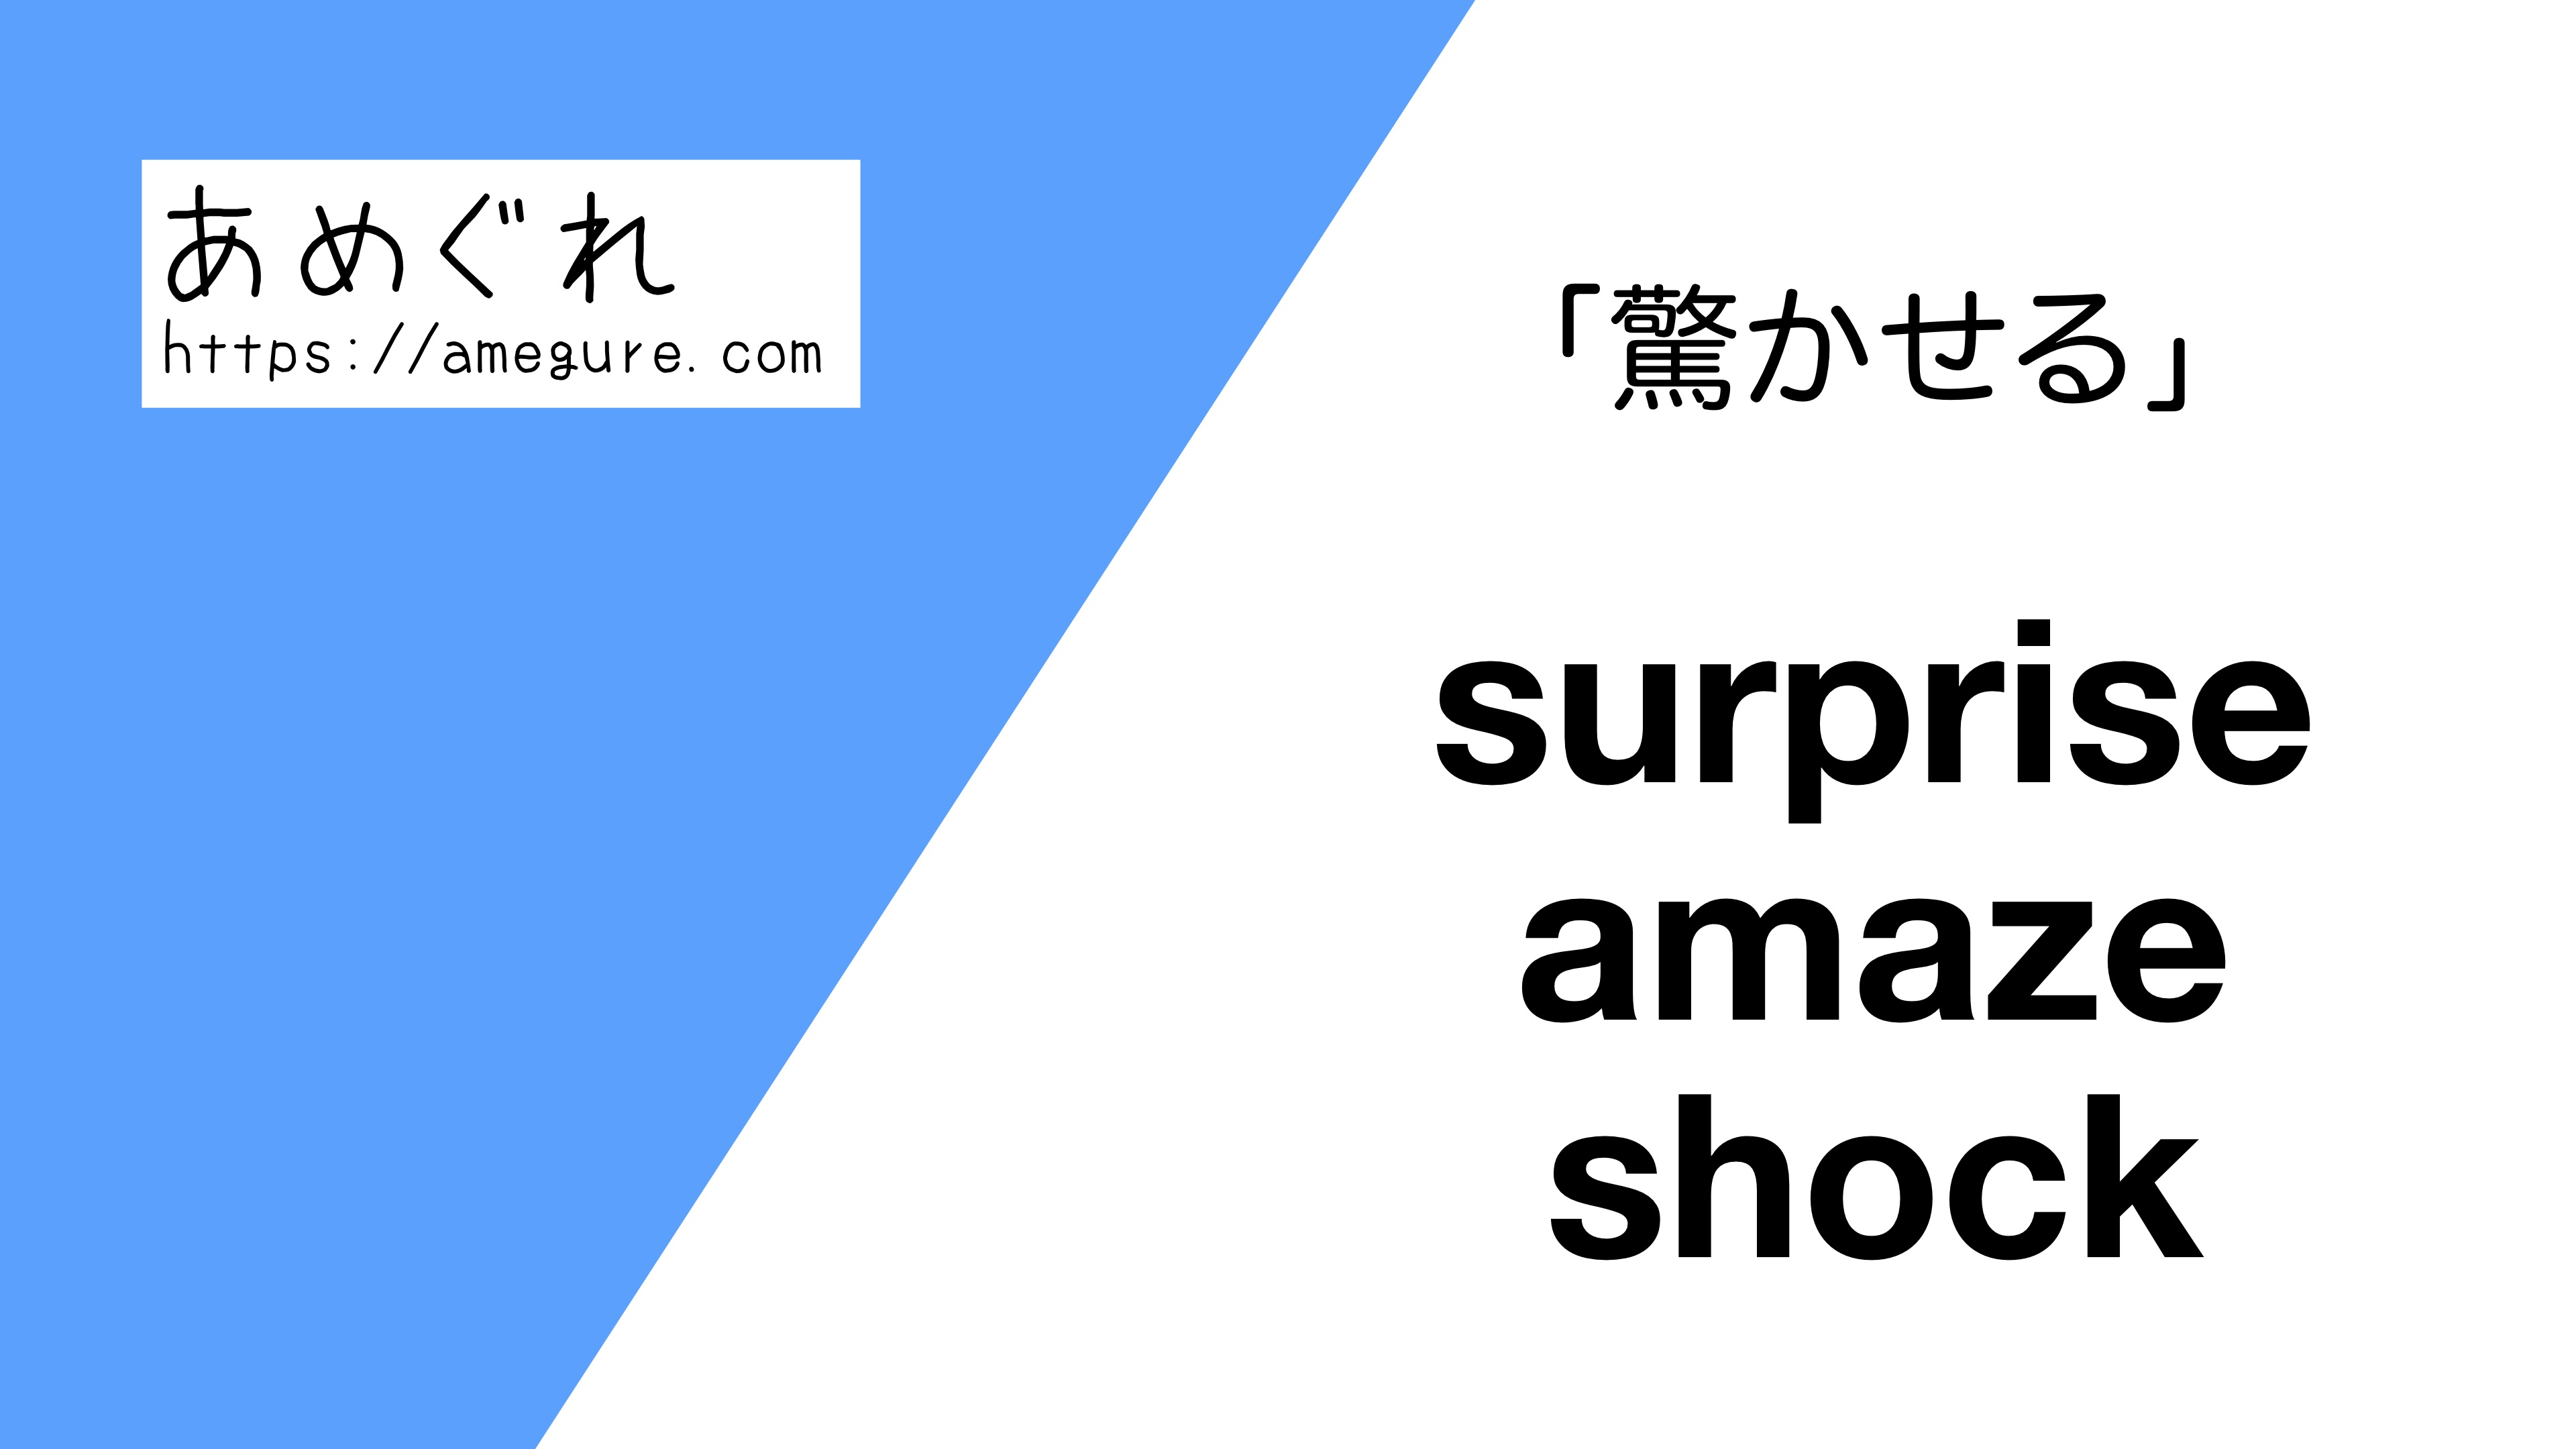 surprise-amaze-shock違い